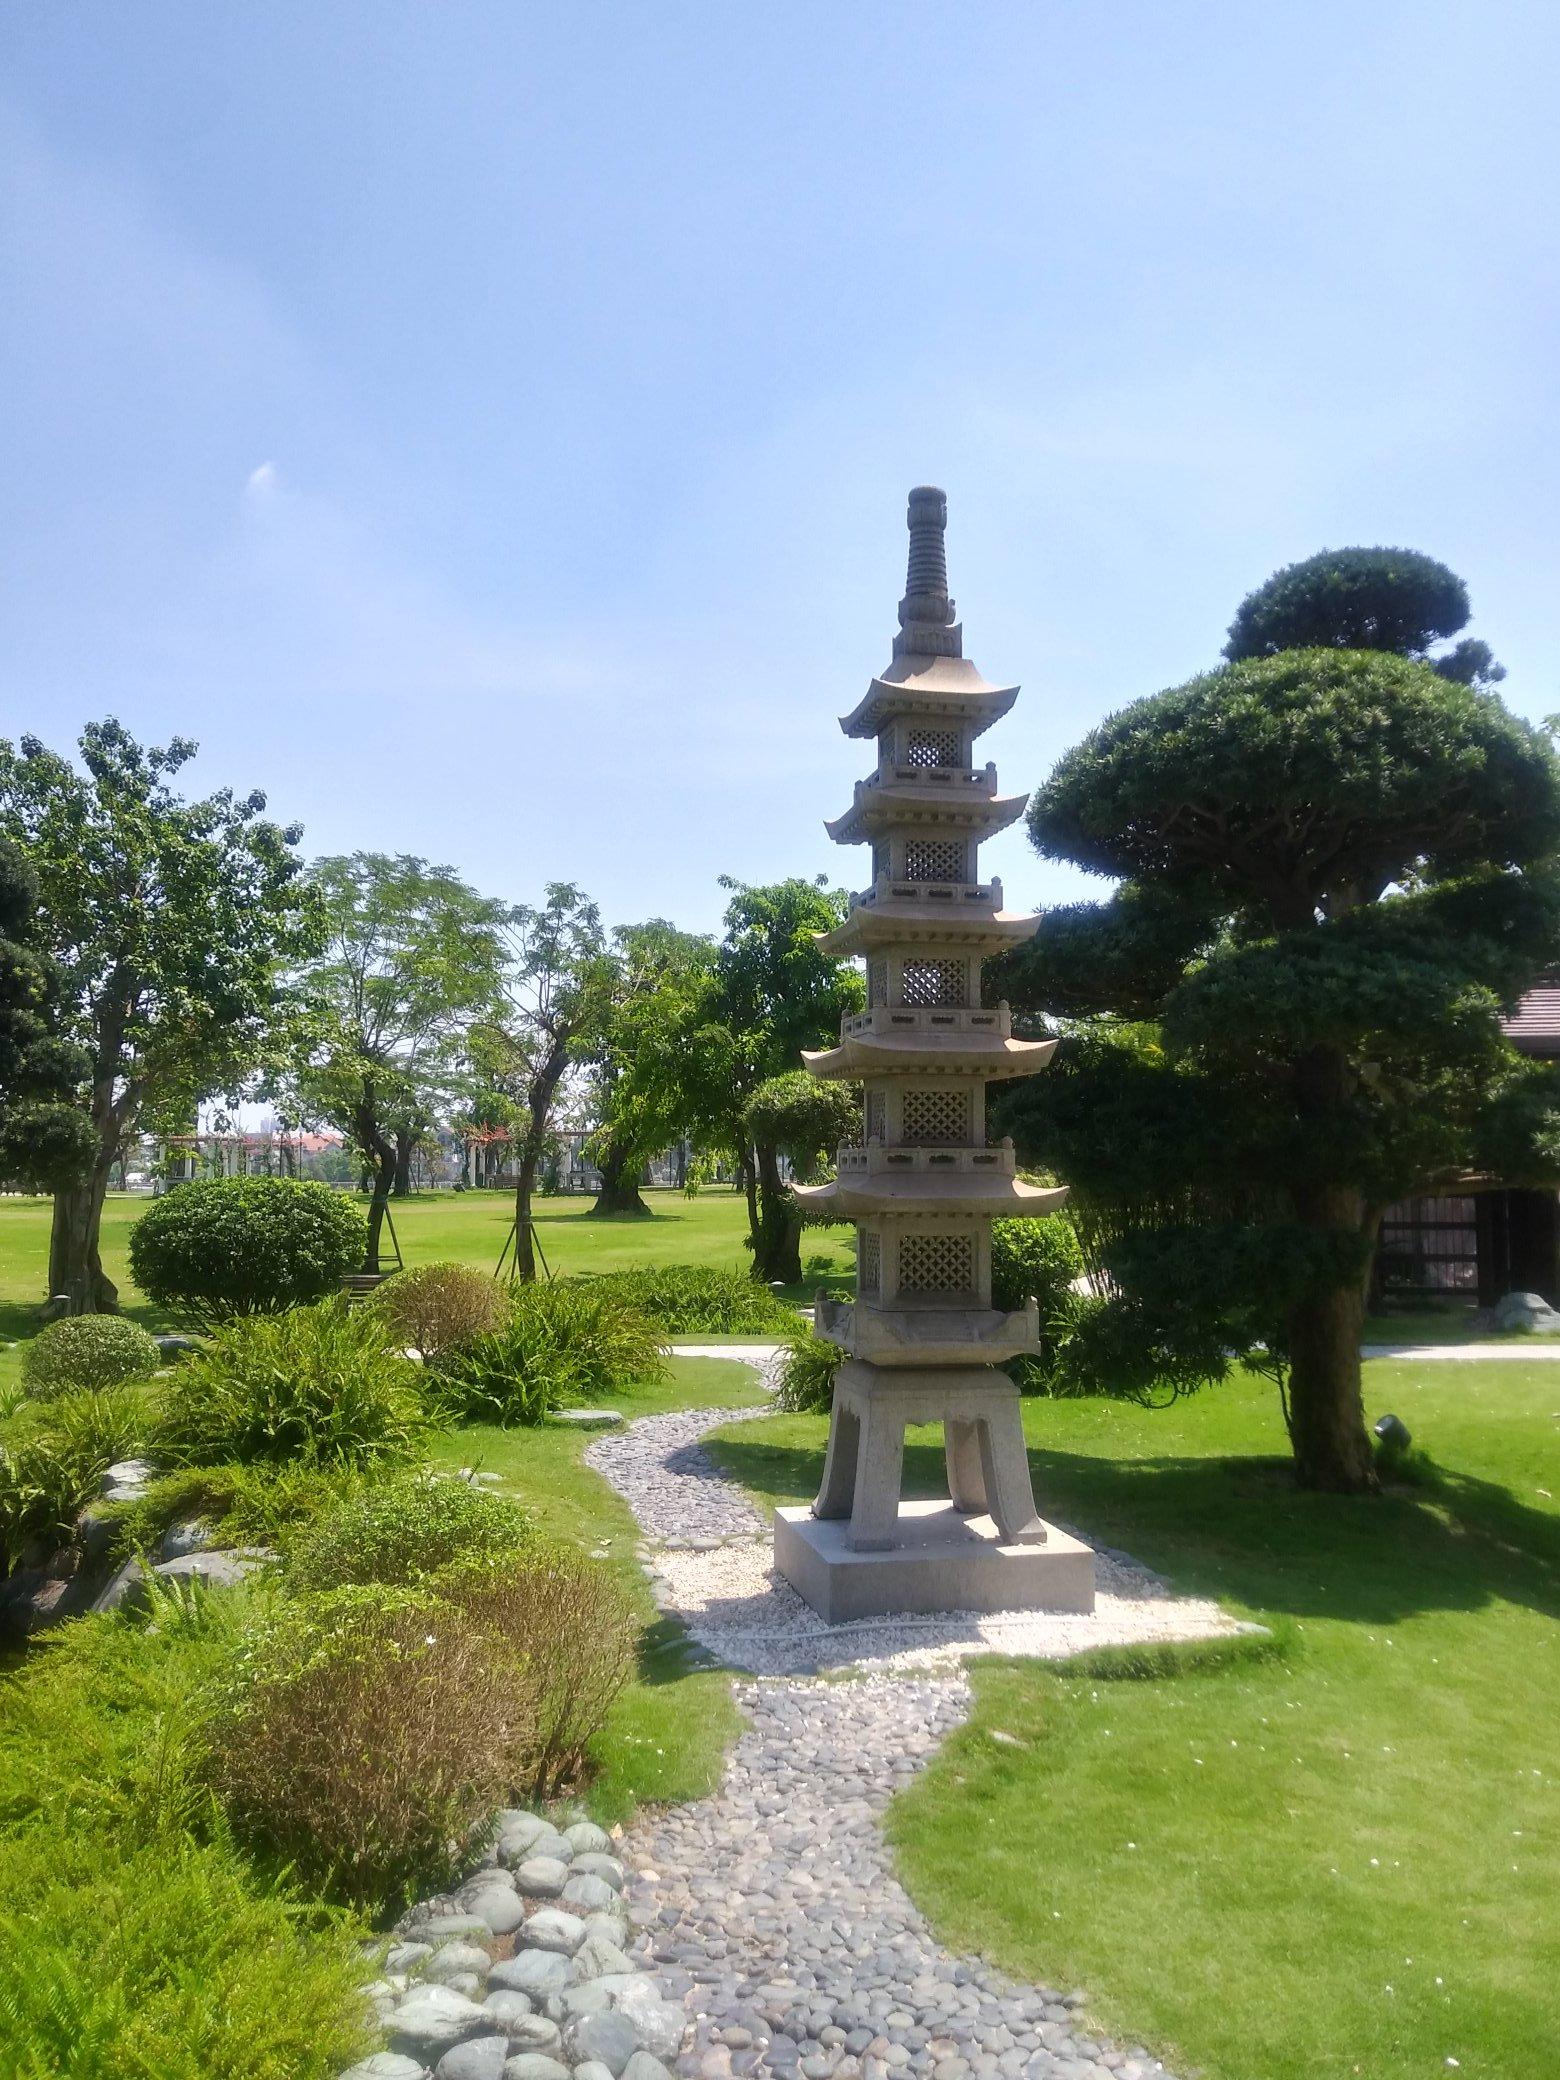 Stay zen at Vinhomes park